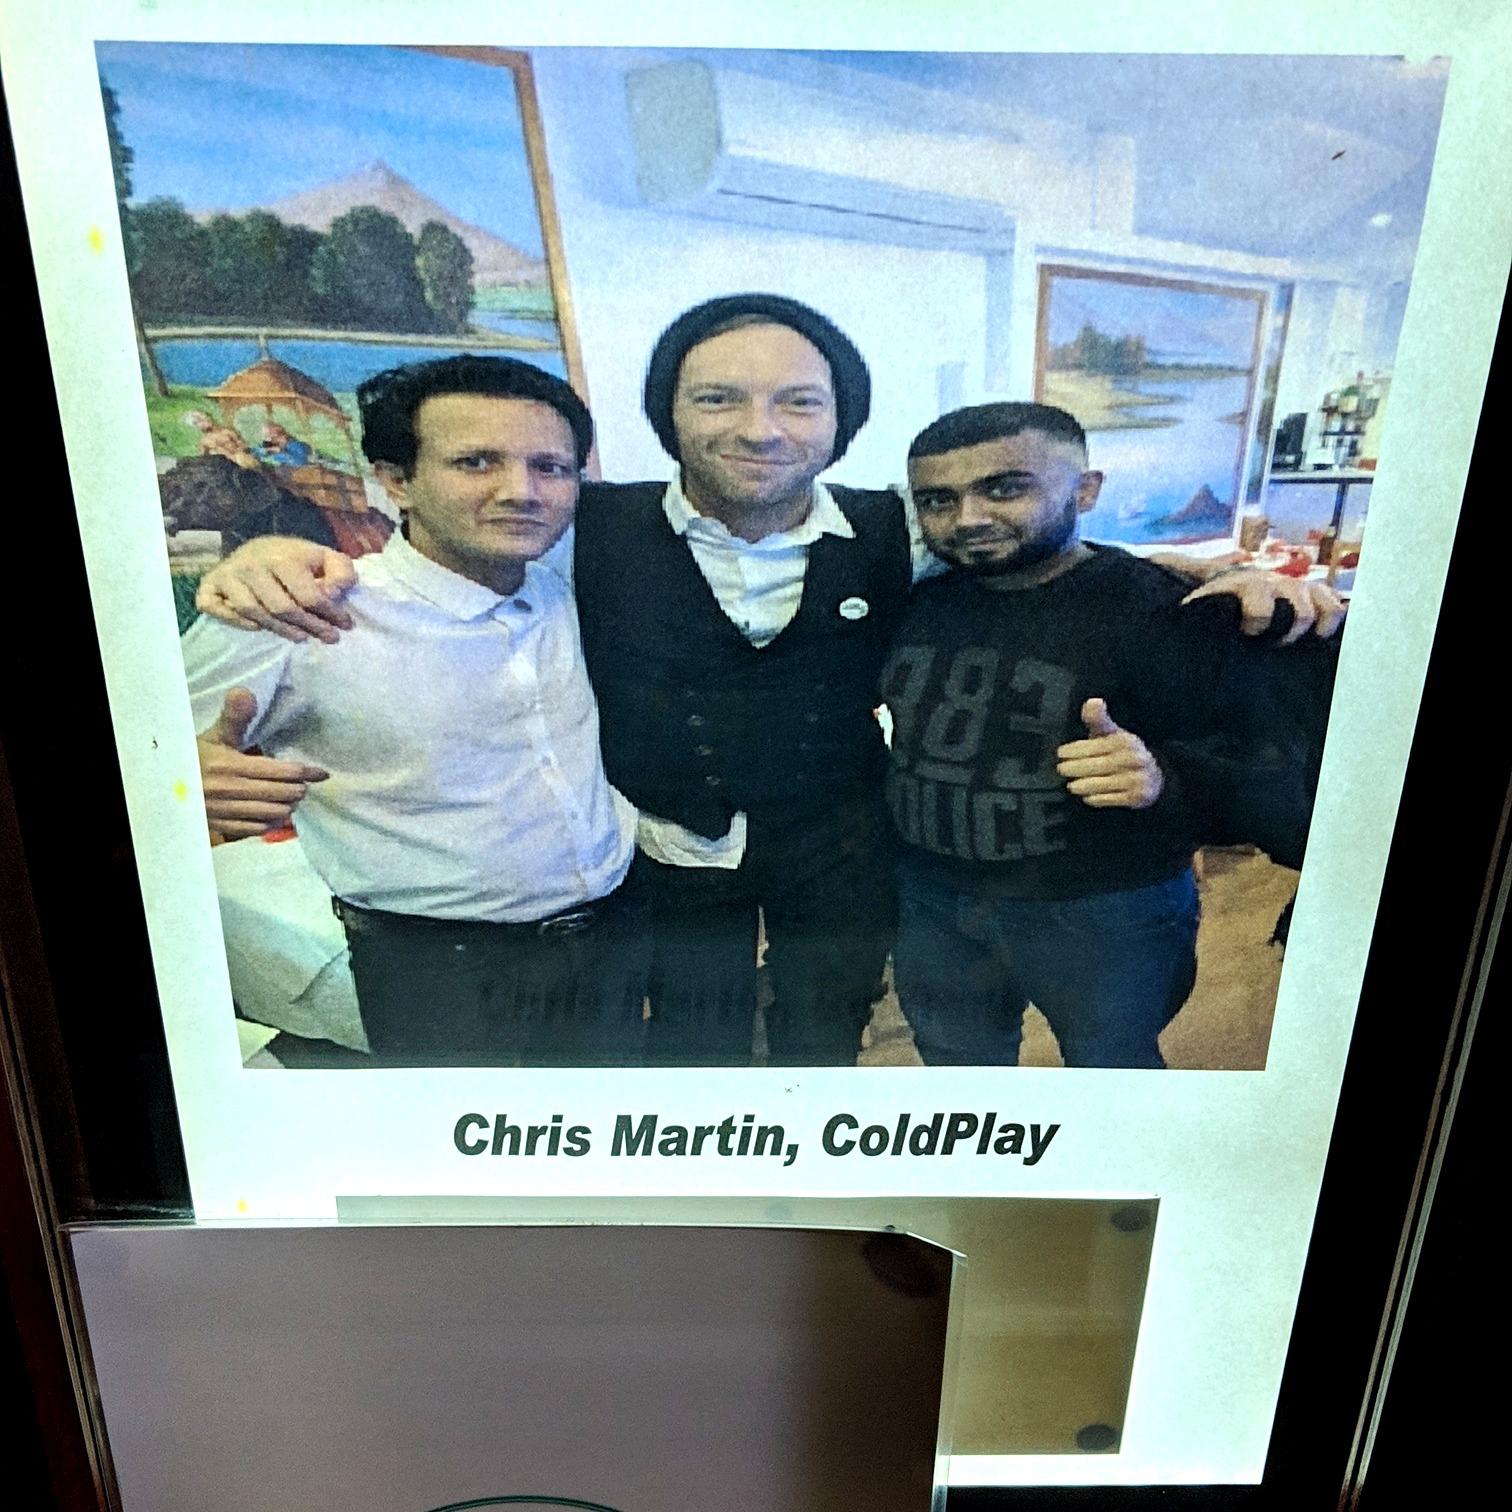 Coldplay's Chris Martin